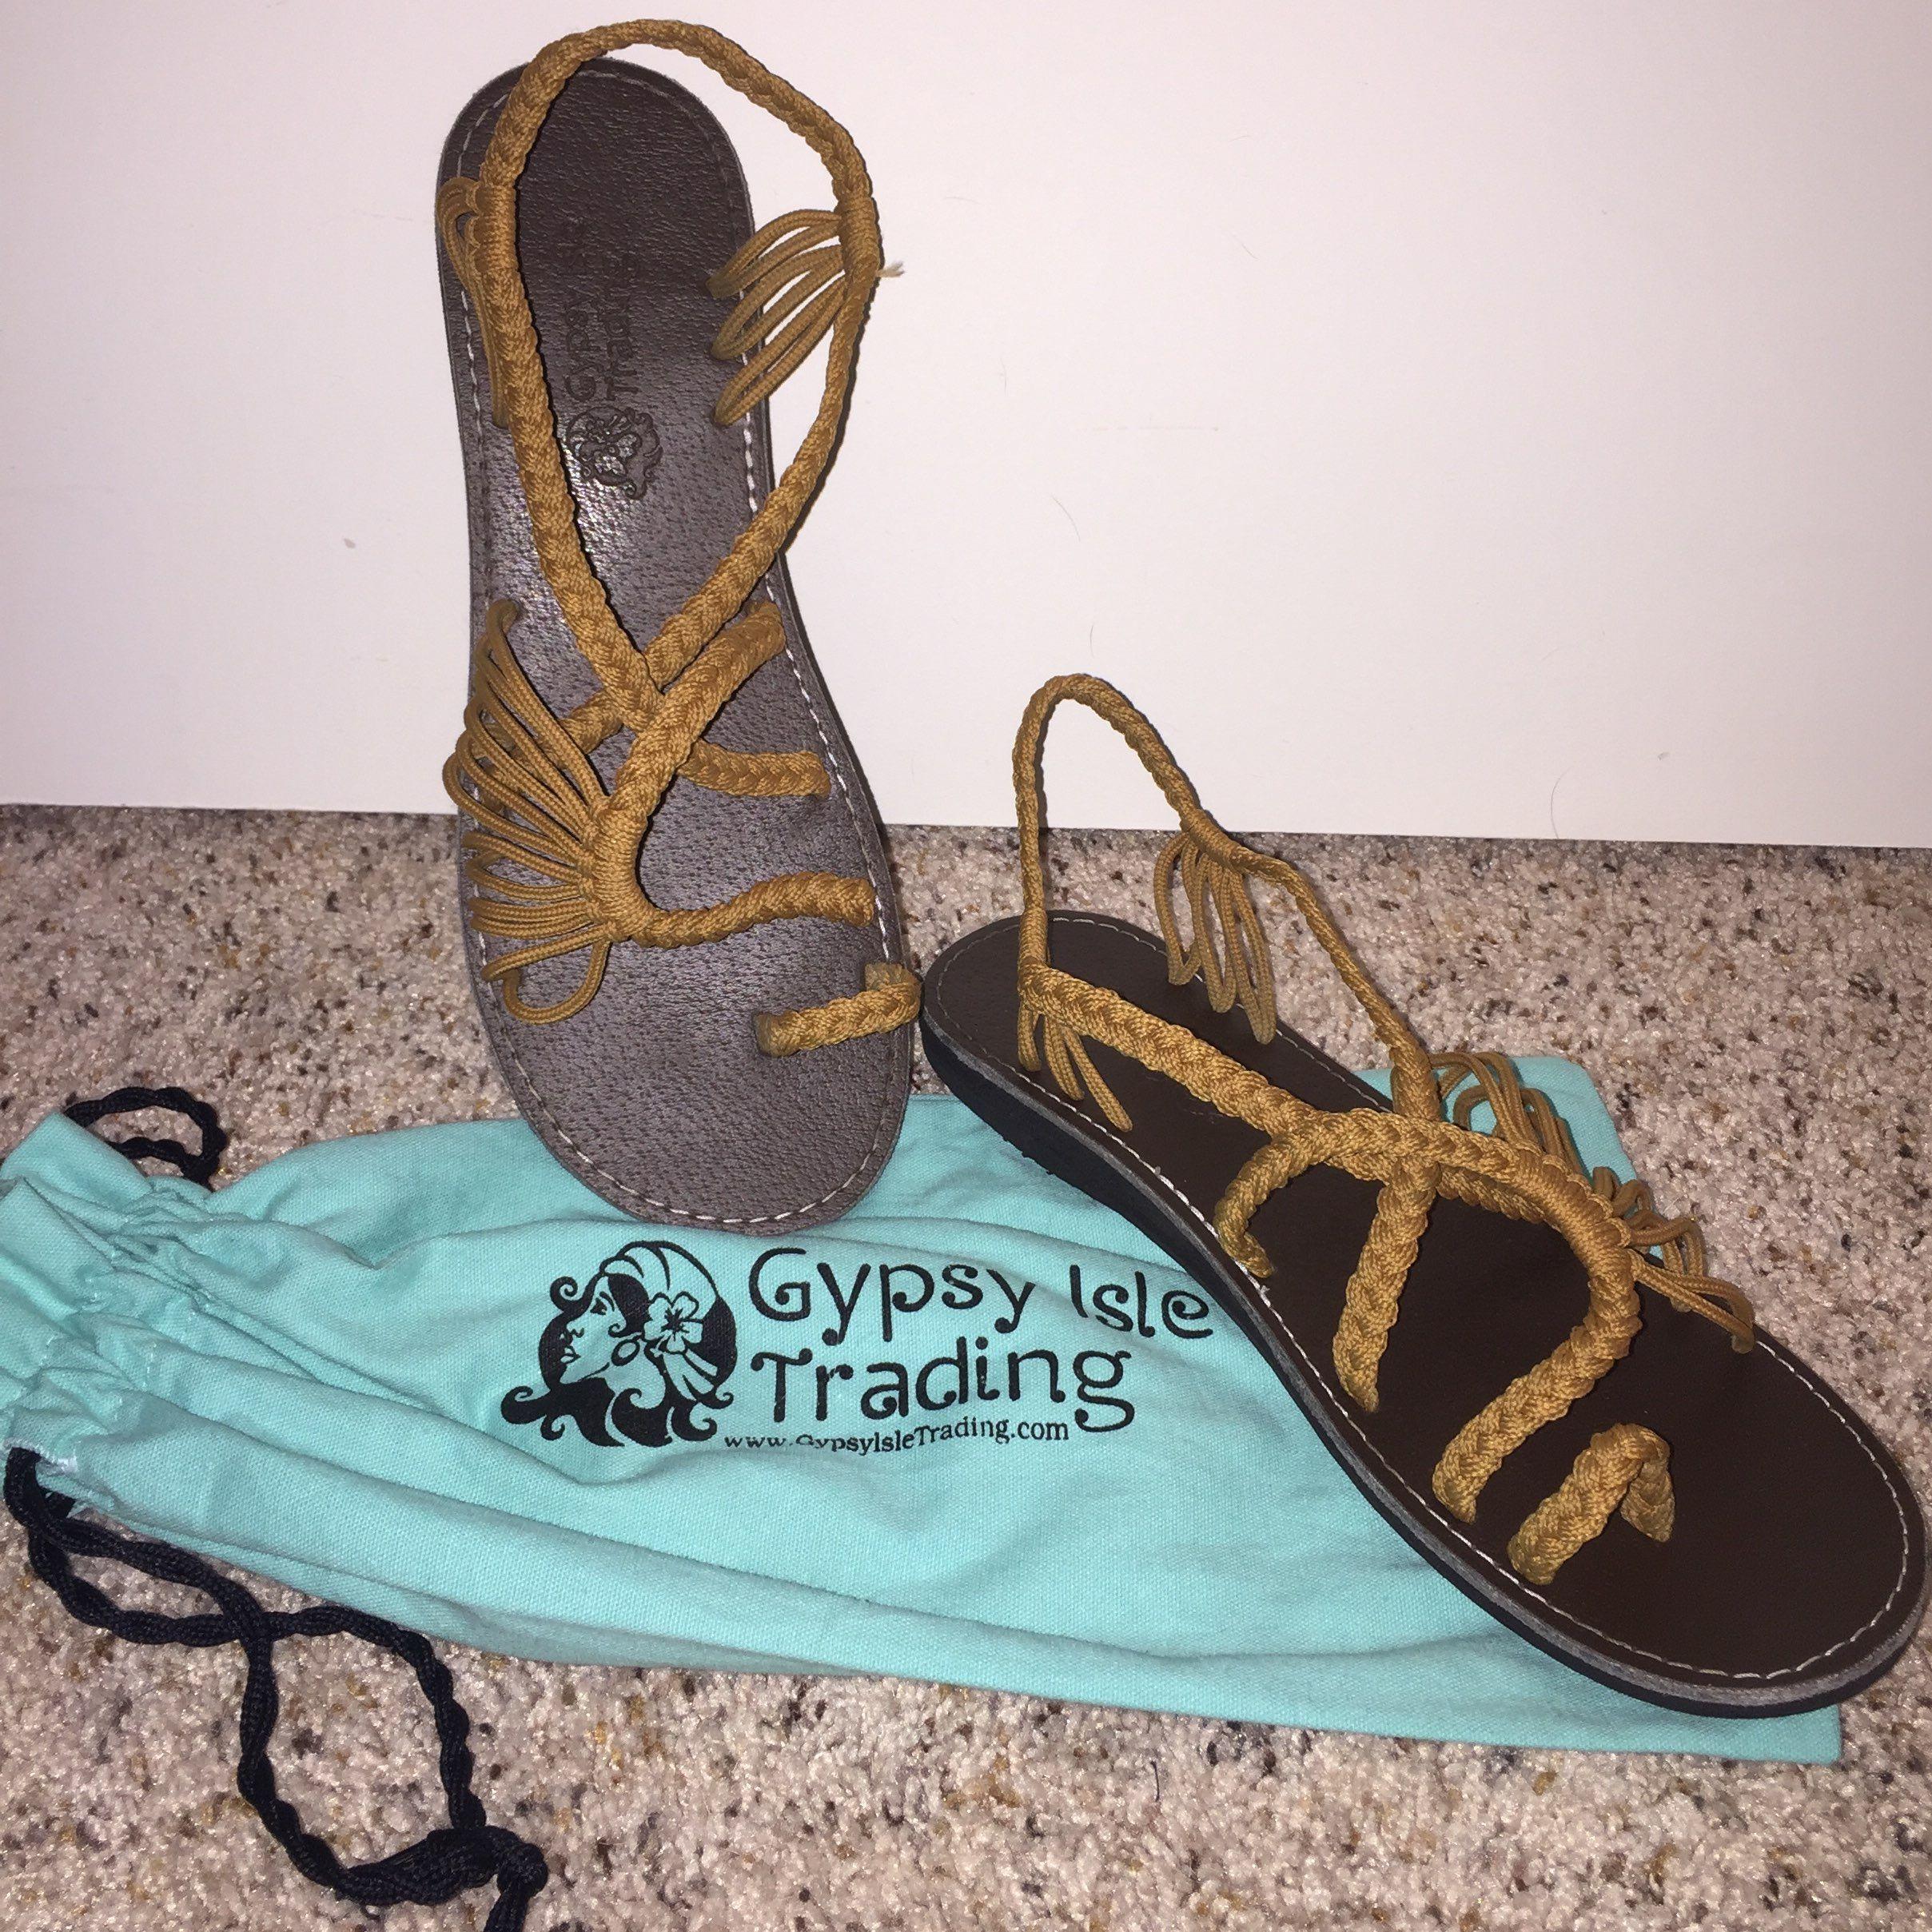 Boho Sandals - GypsyIsleTradingCo